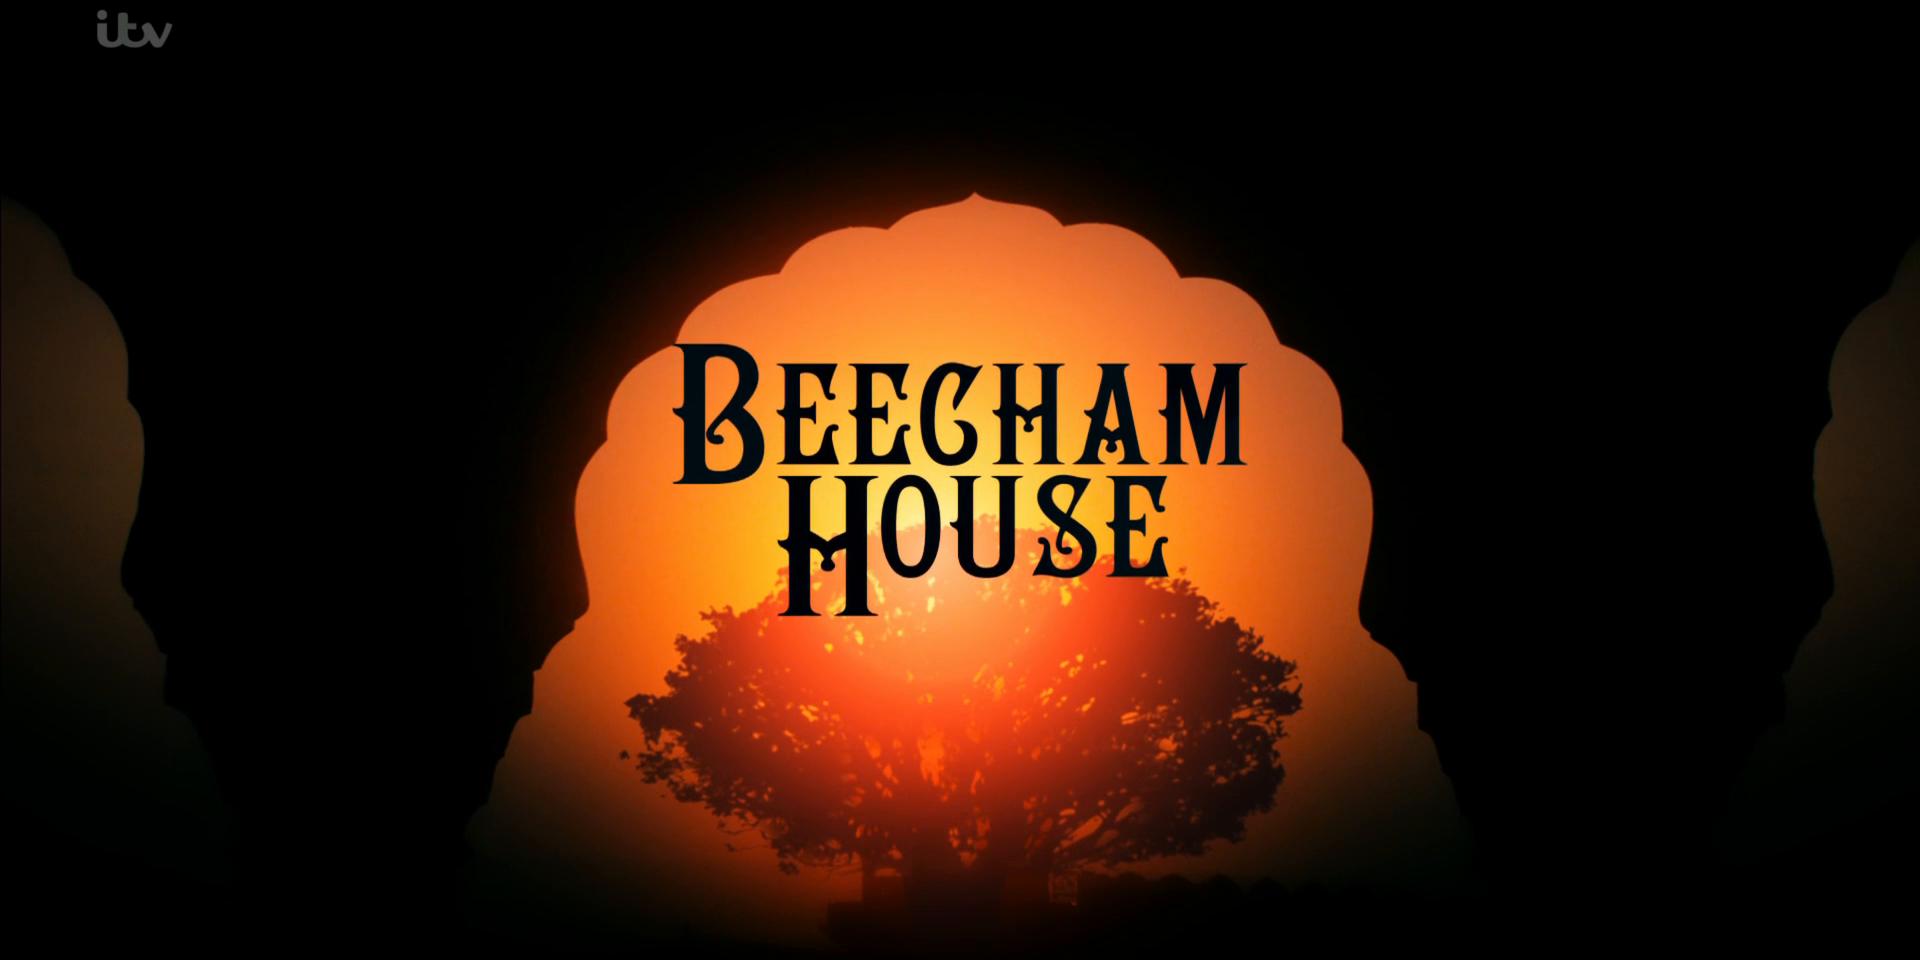 Beecham House S01E03 1080p HDTV x264-MTB